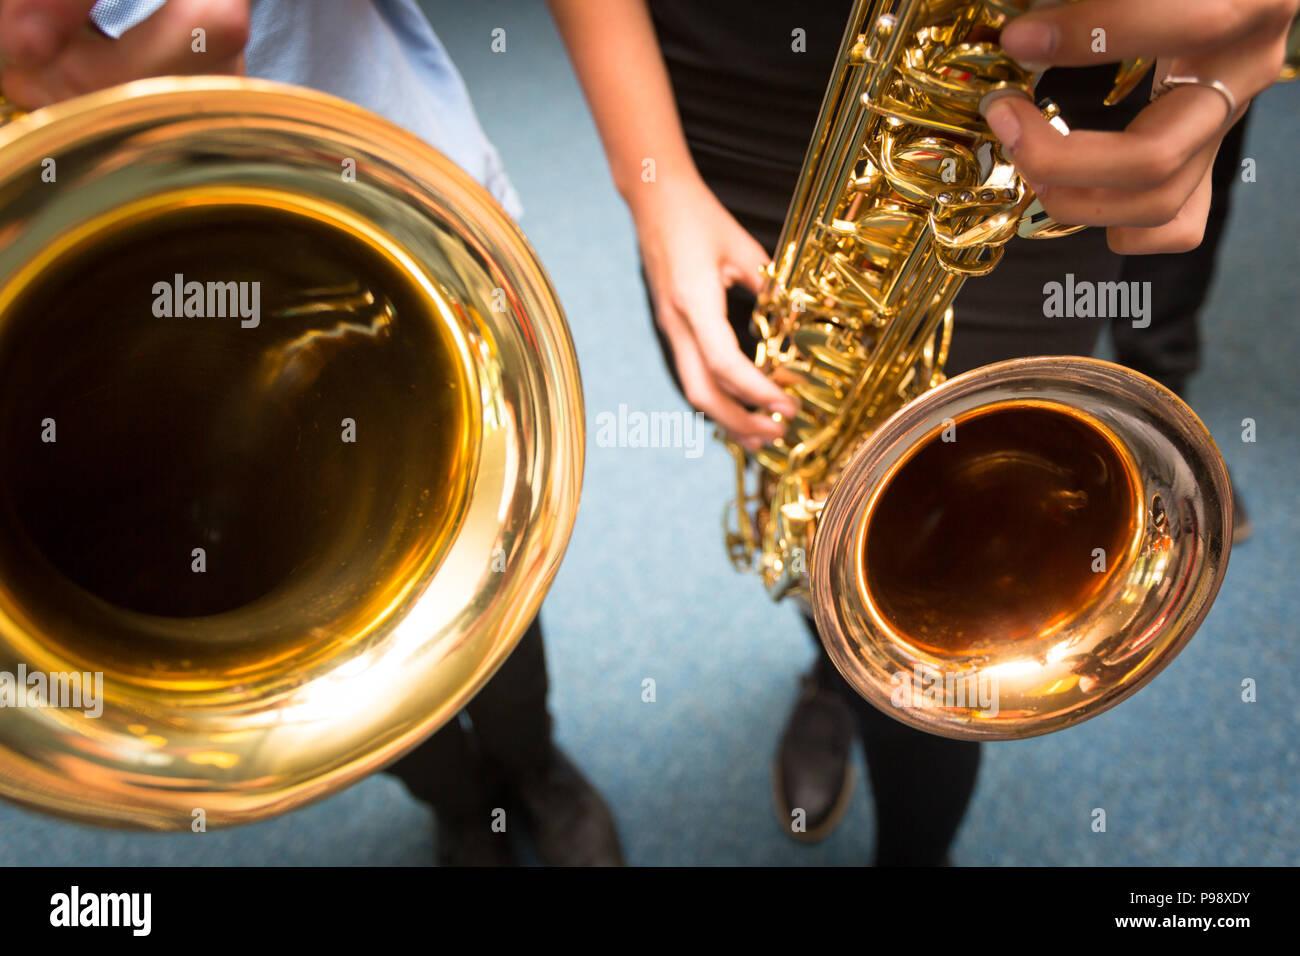 Two secondary aged school children holding saxophones UK - Stock Image